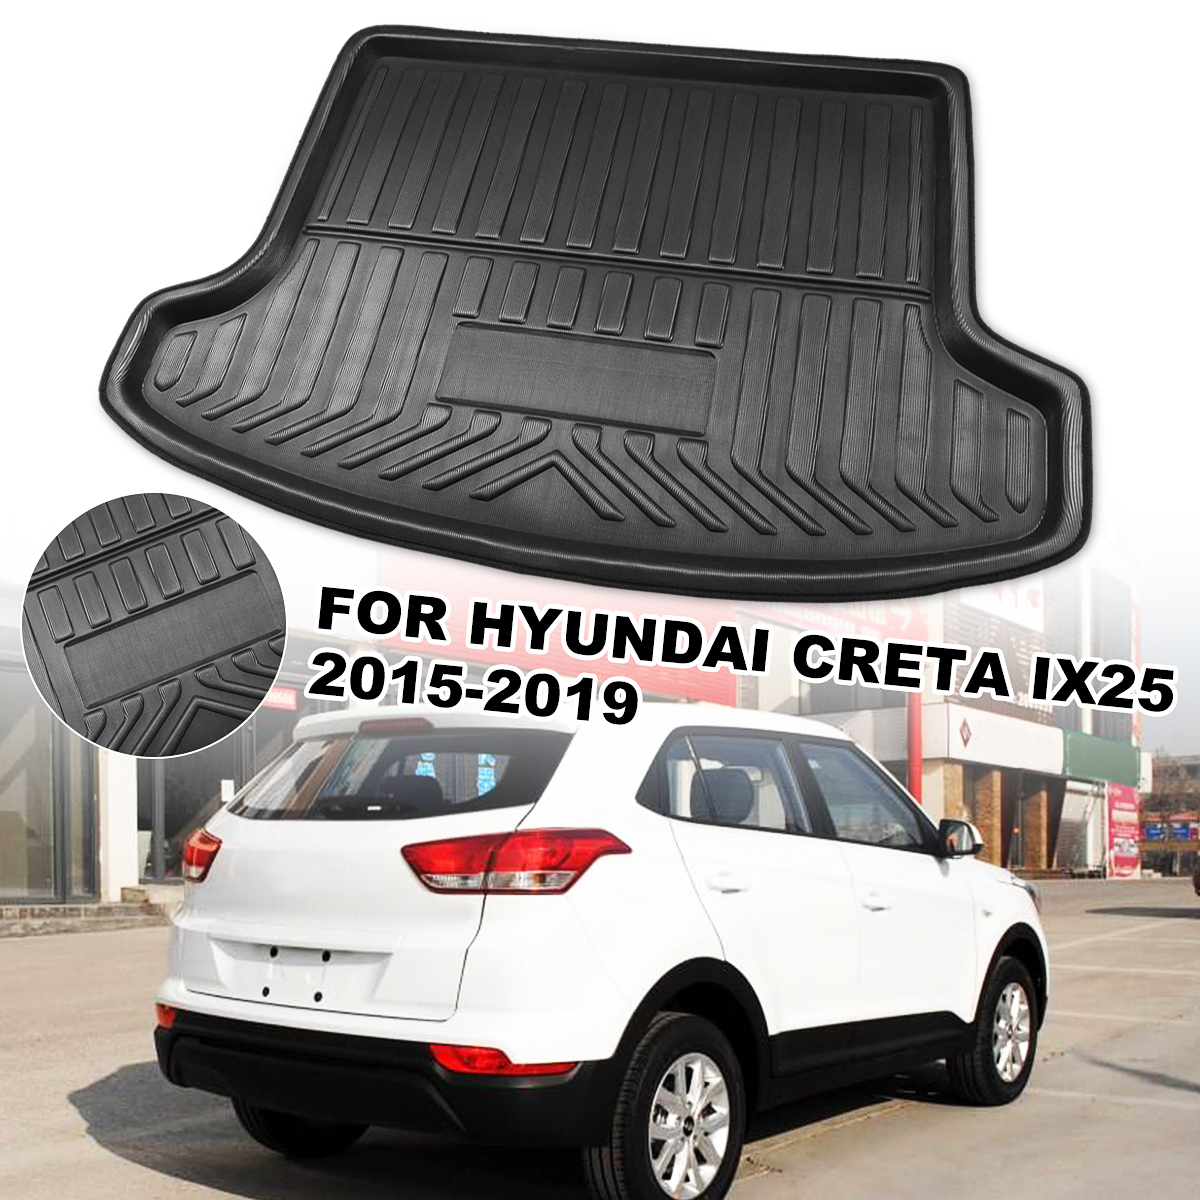 Car Cargo Liner Boot Tray Rear Trunk Cover Matt Mat Floor Carpet Kick Pad For Hyundai Creta ix25 2015 2016 2017 2018 2019|  - title=